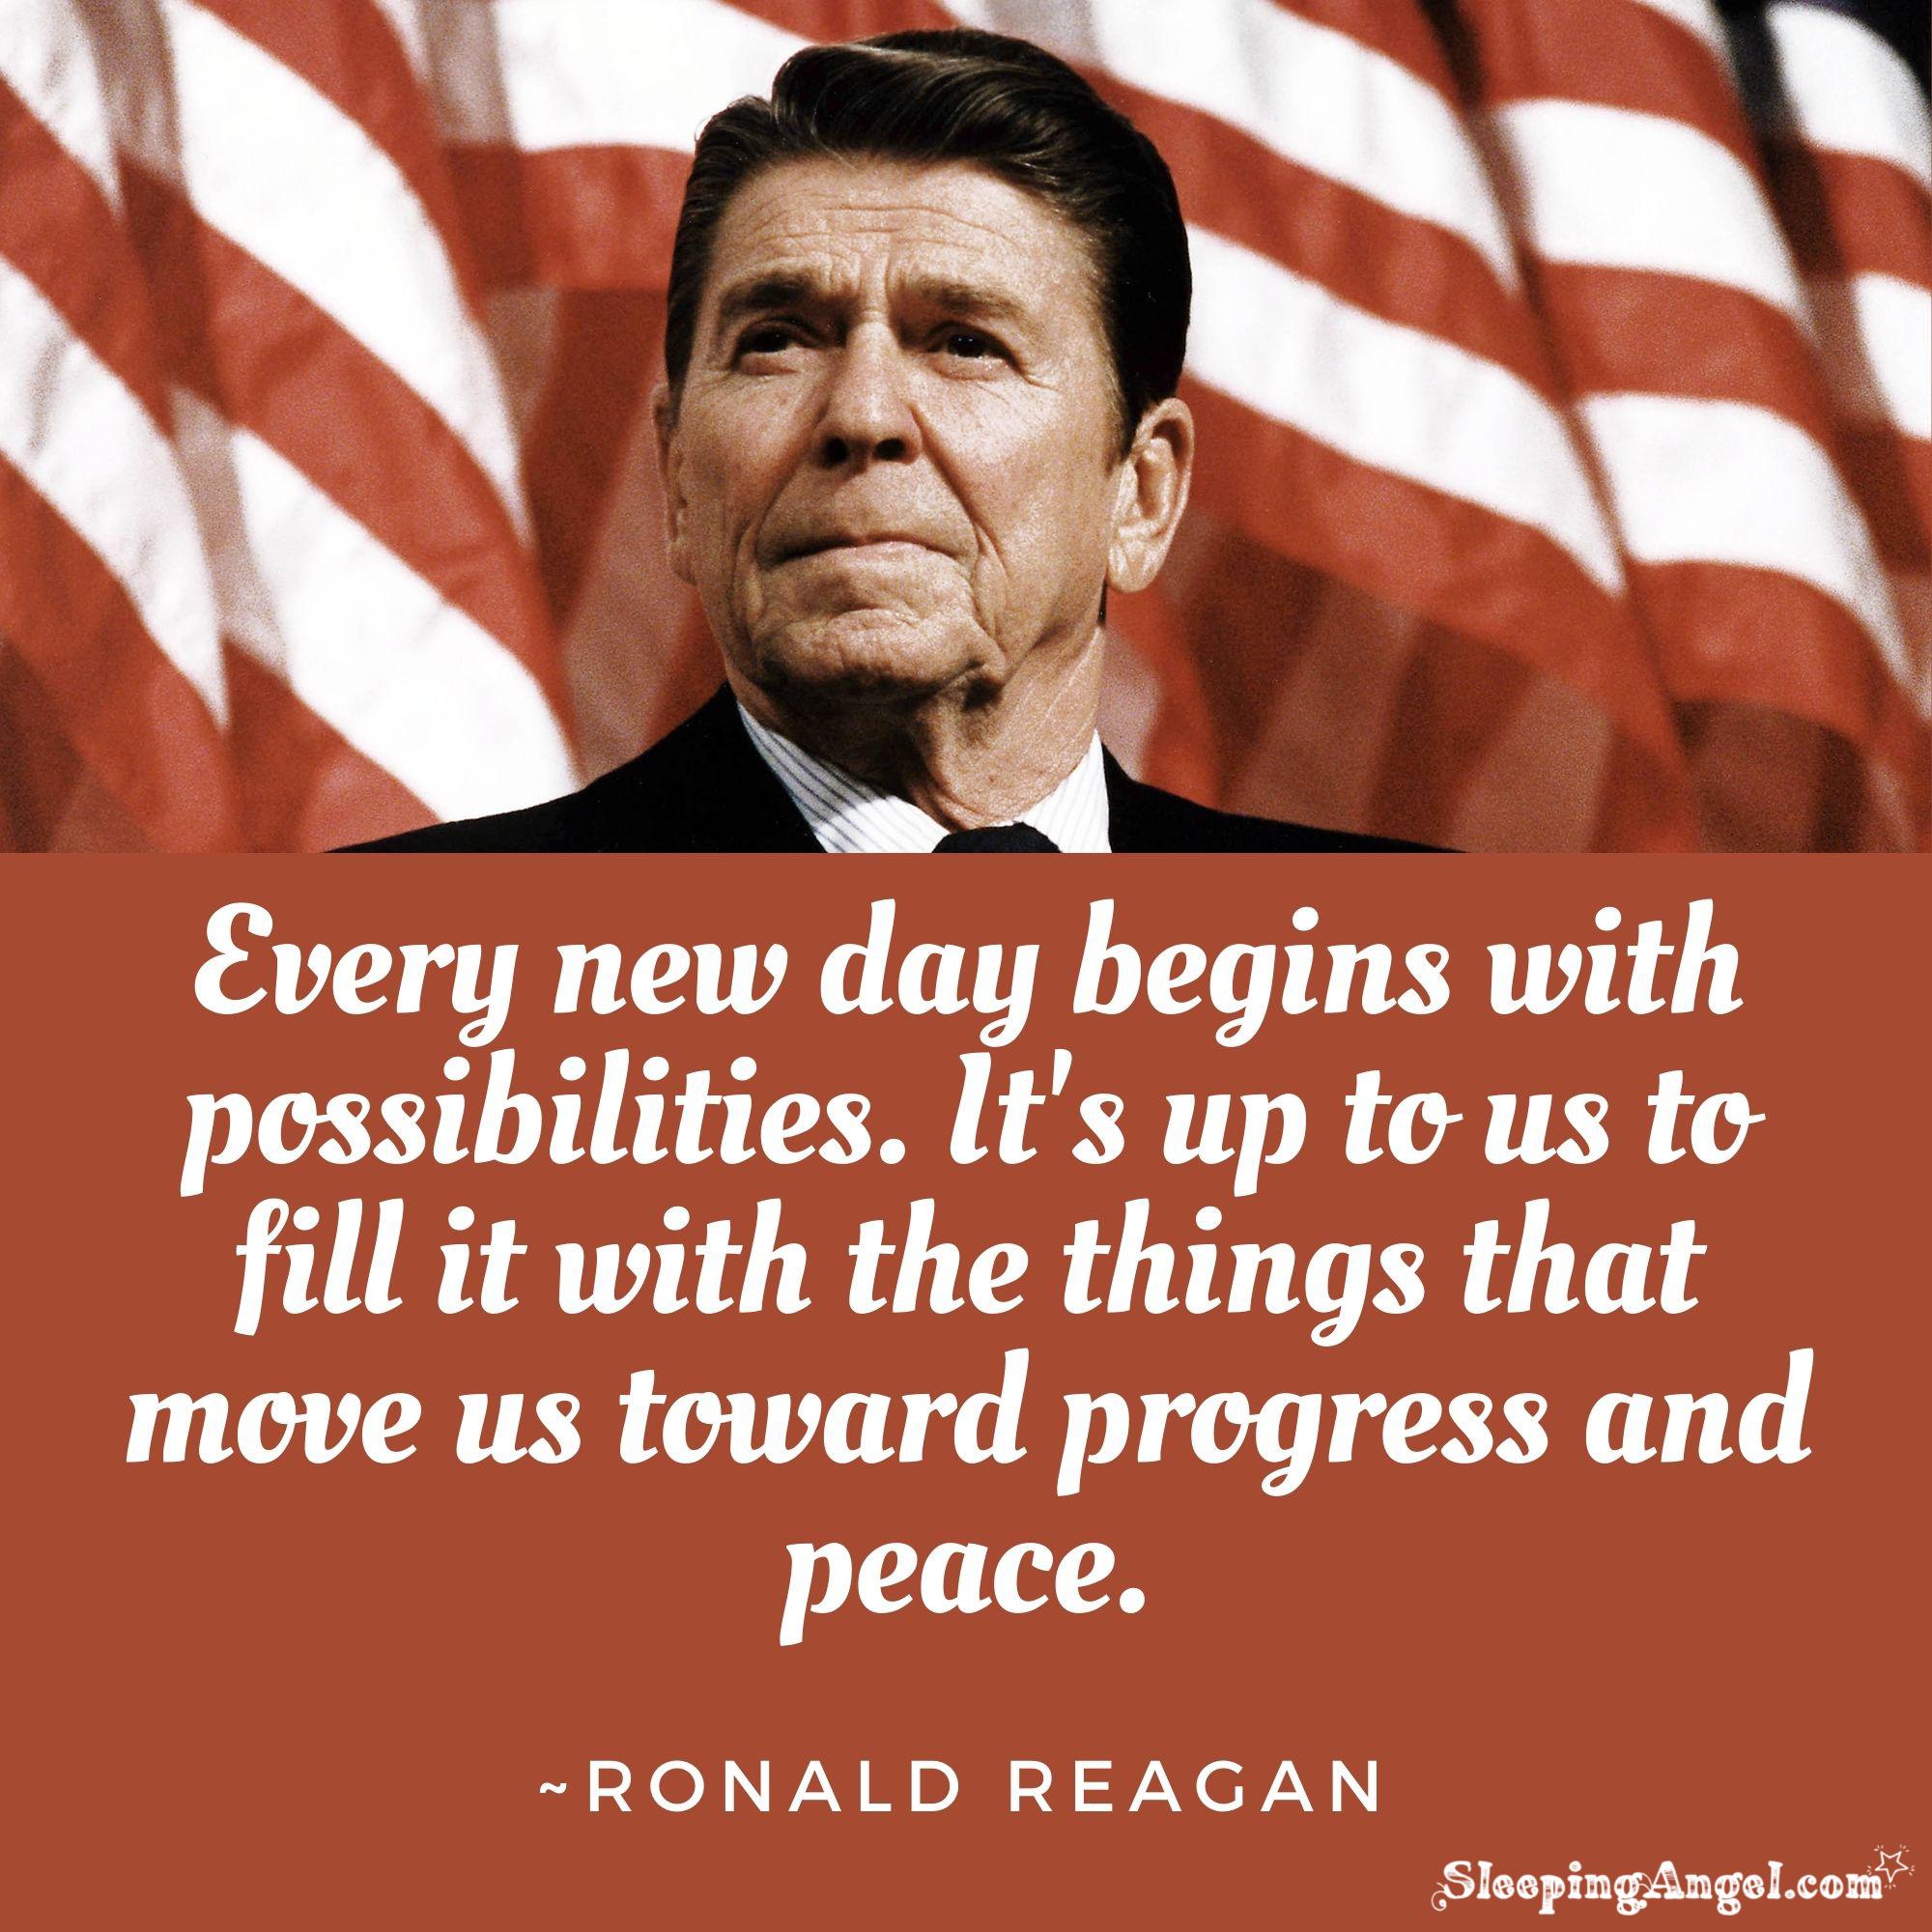 Progress & Peace Quote